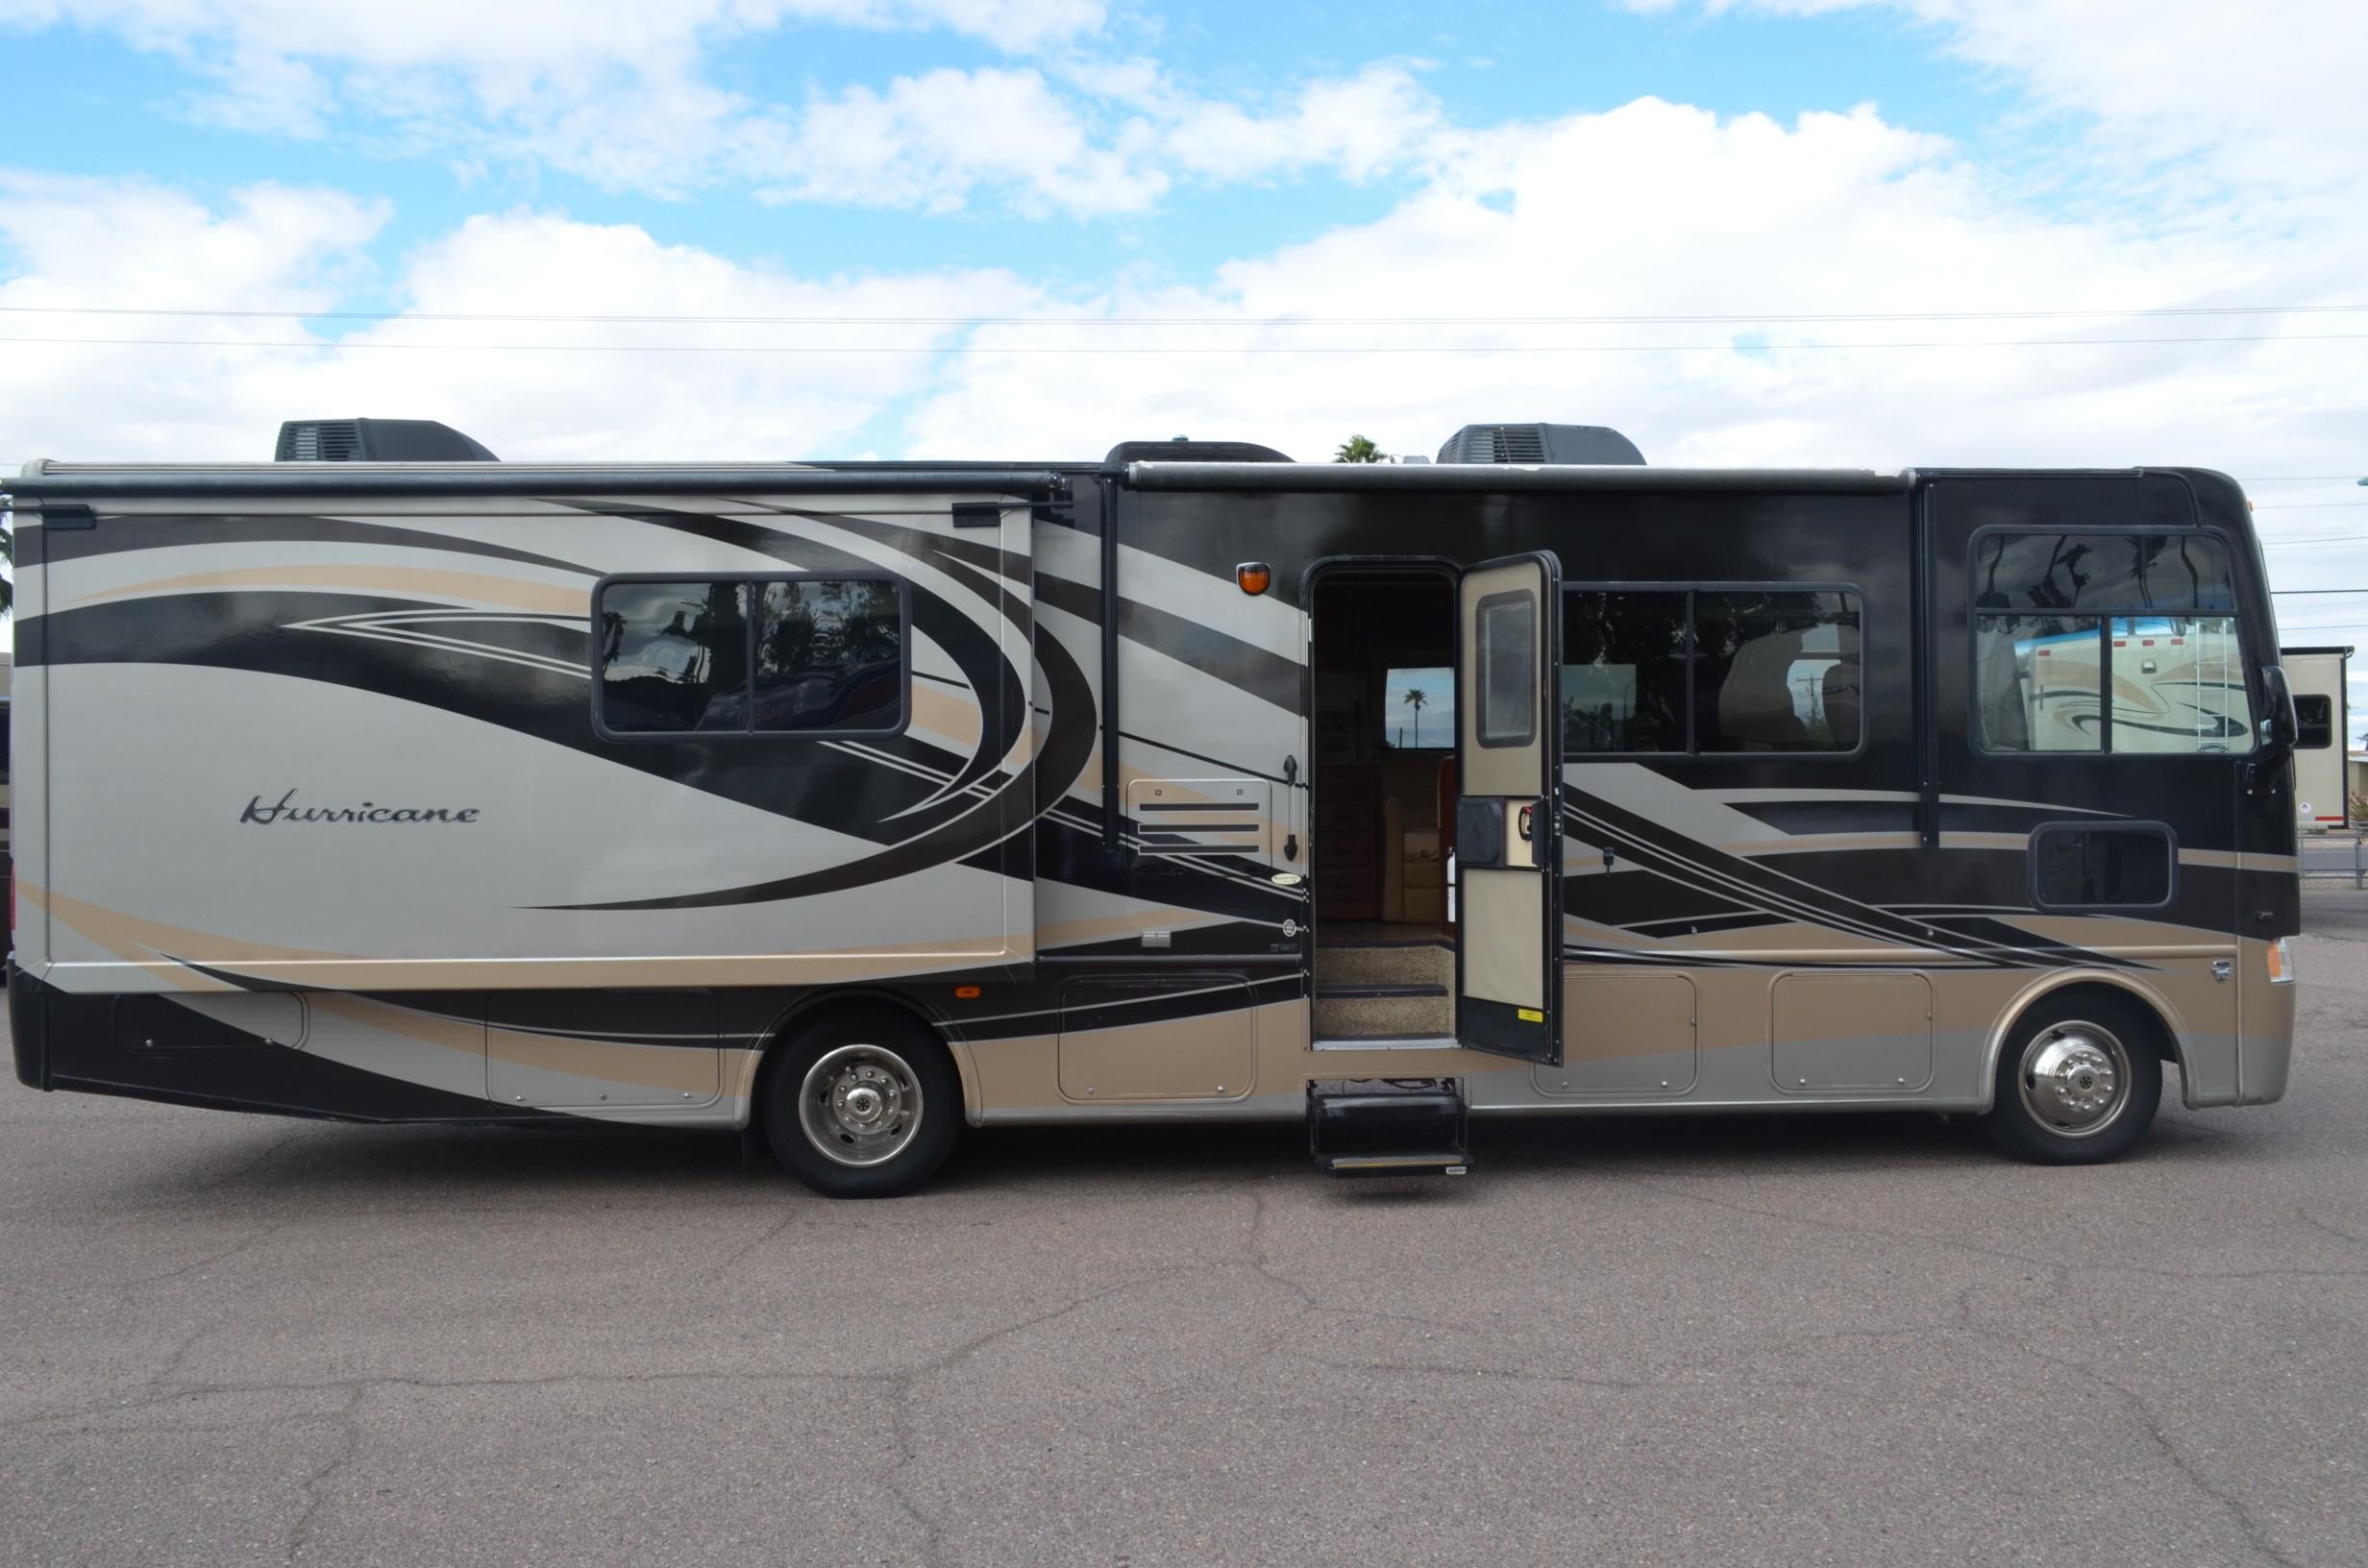 Used, 2013, Thor Motor Coach, Hurricane 33g, RV - Class A